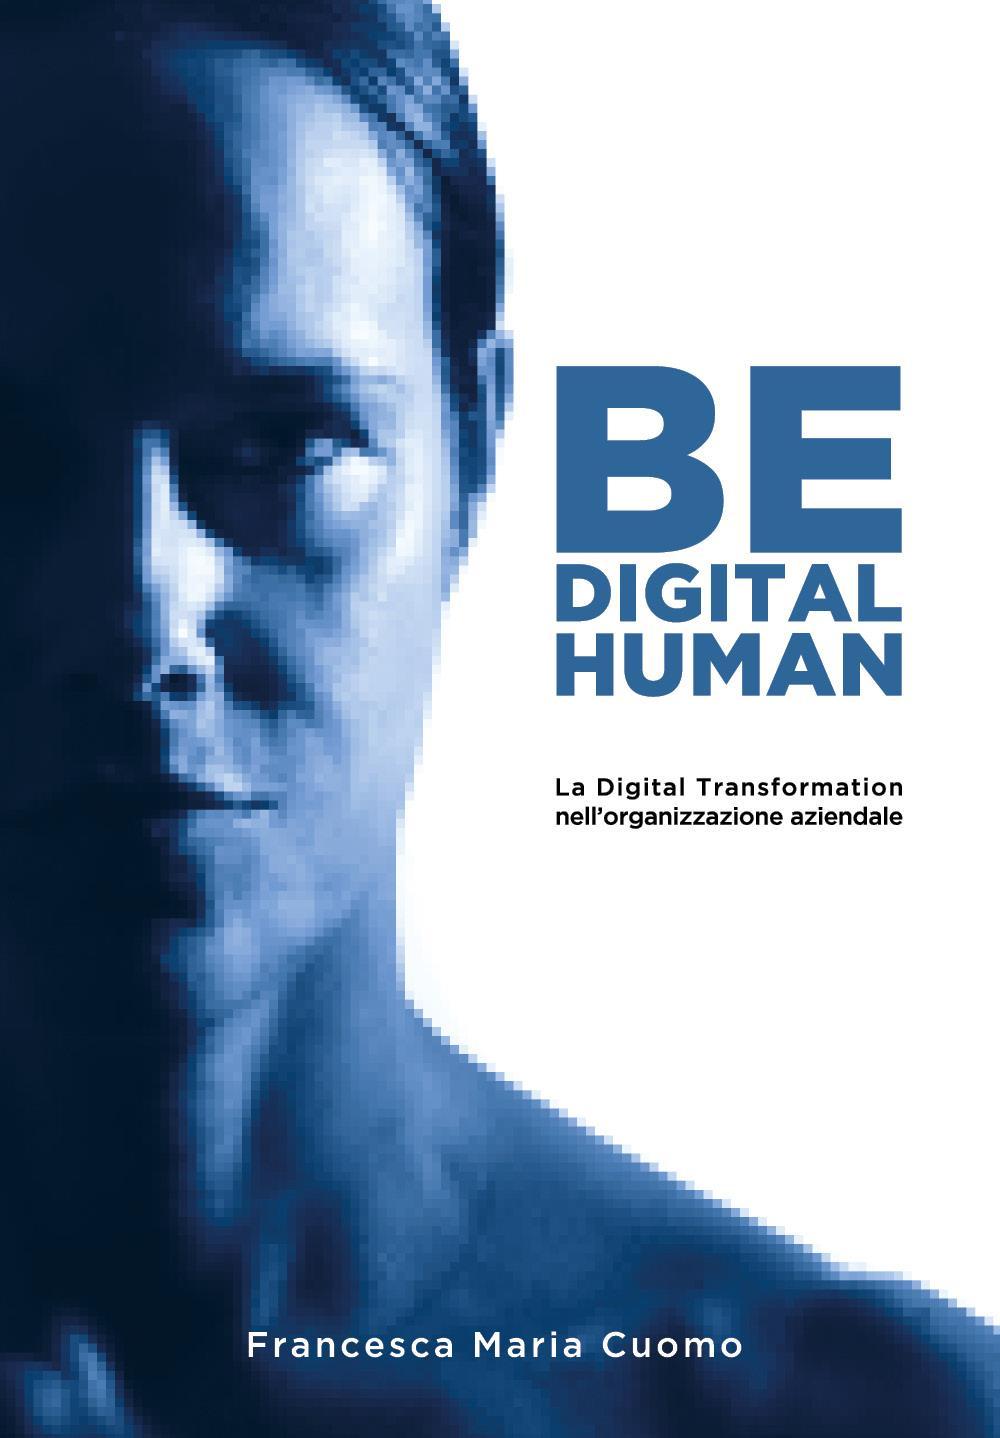 Be digital human